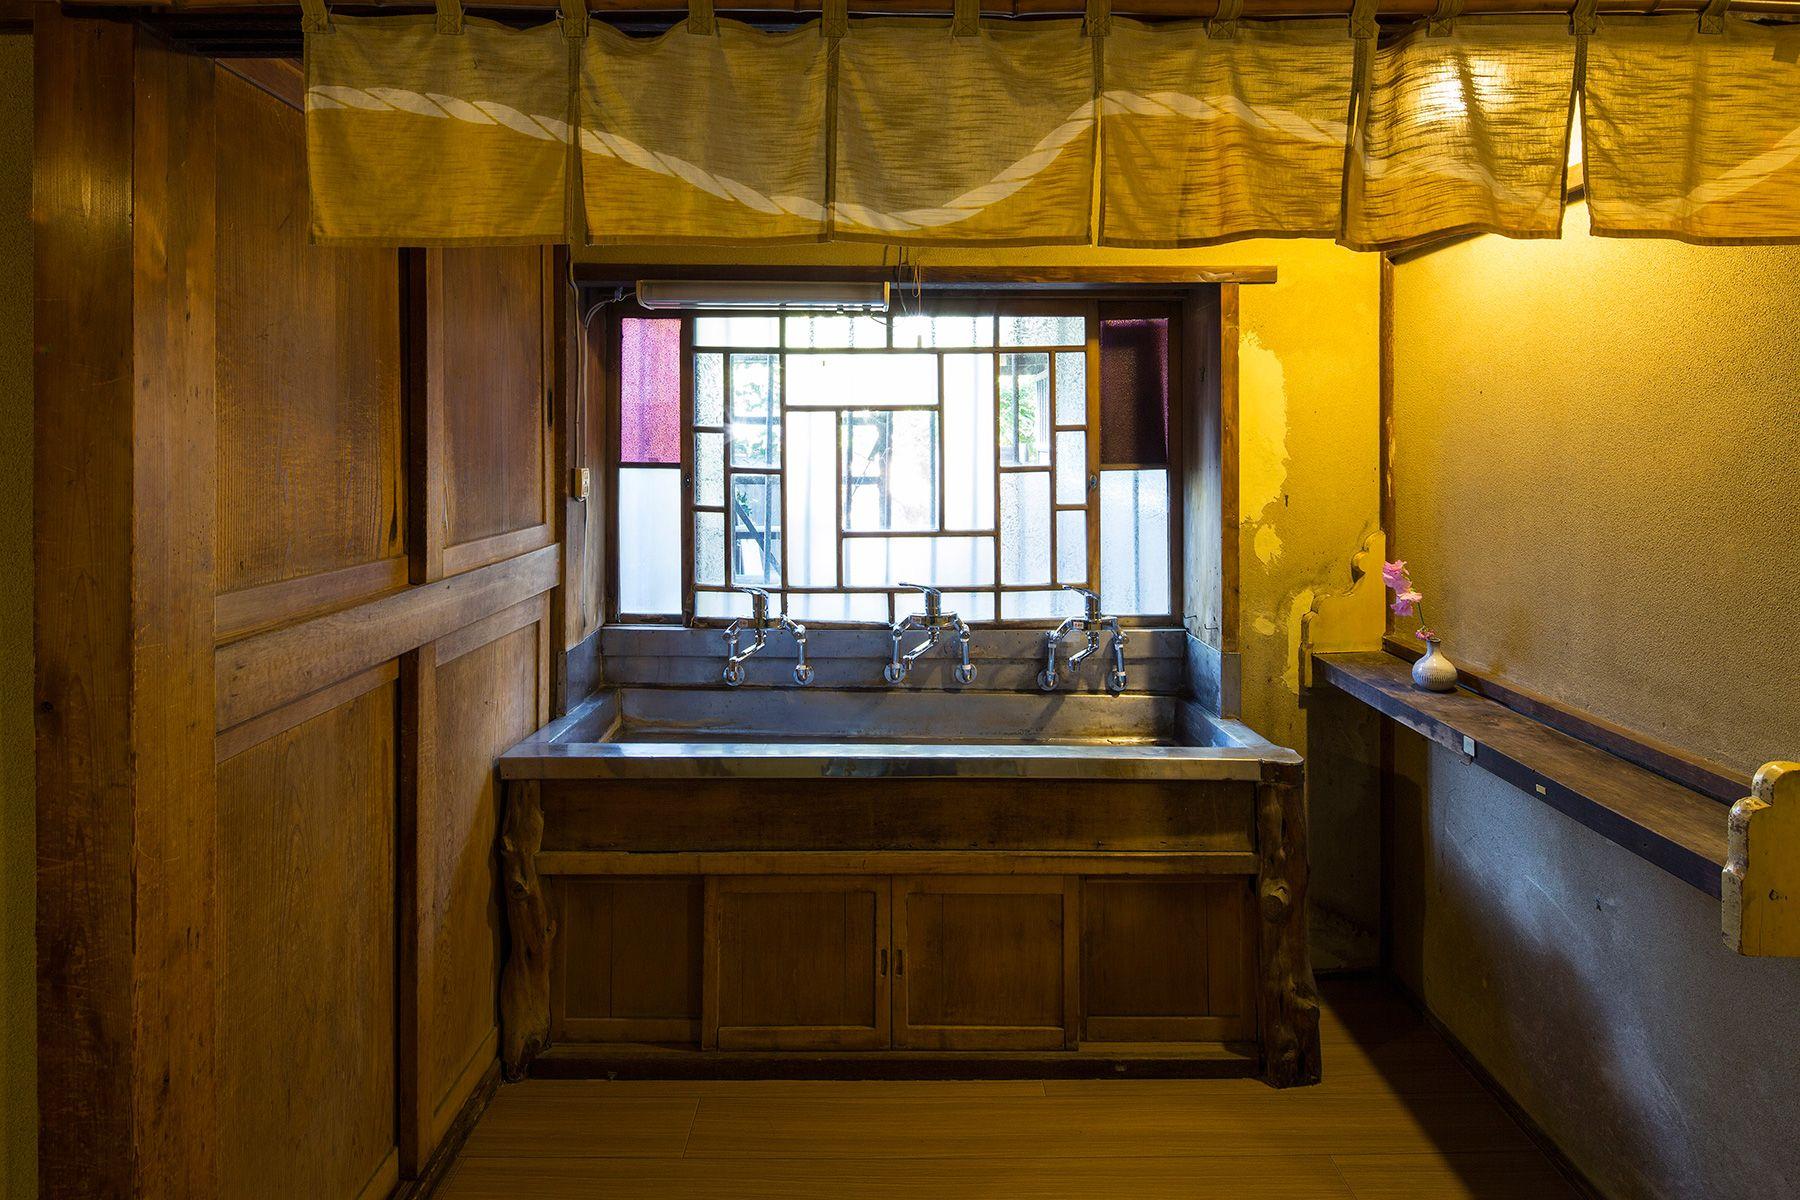 旅館 喜多屋 (キタヤ)洗面所